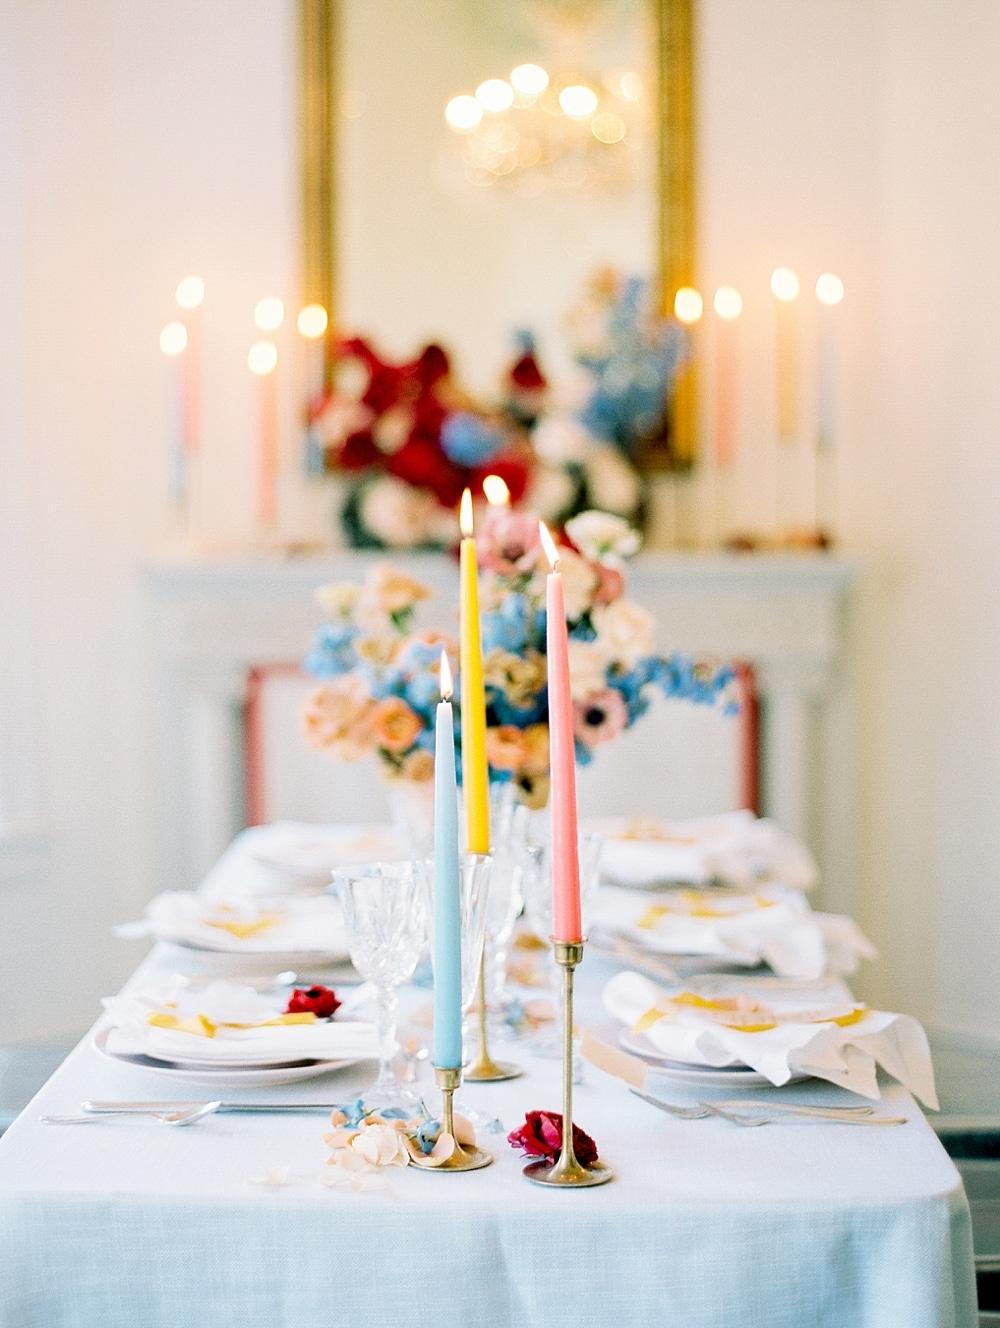 kristin-la-voie-photography-austin-wedding-photographer-woodbine-mansion-210